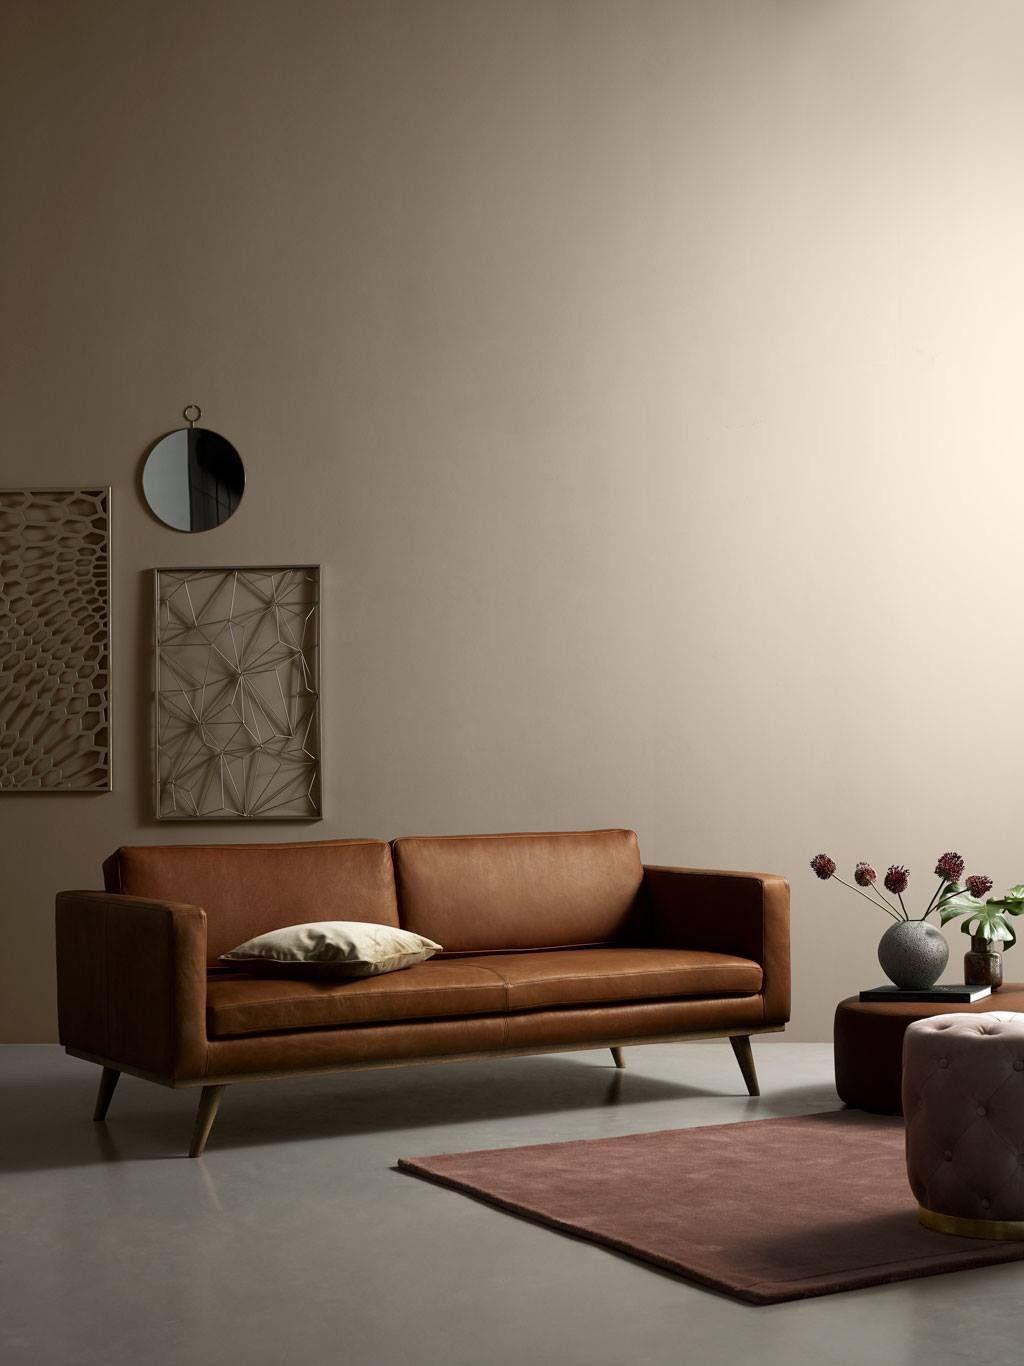 Johan Sofacompany Nl 3 Sitzer Sofa Design Modern